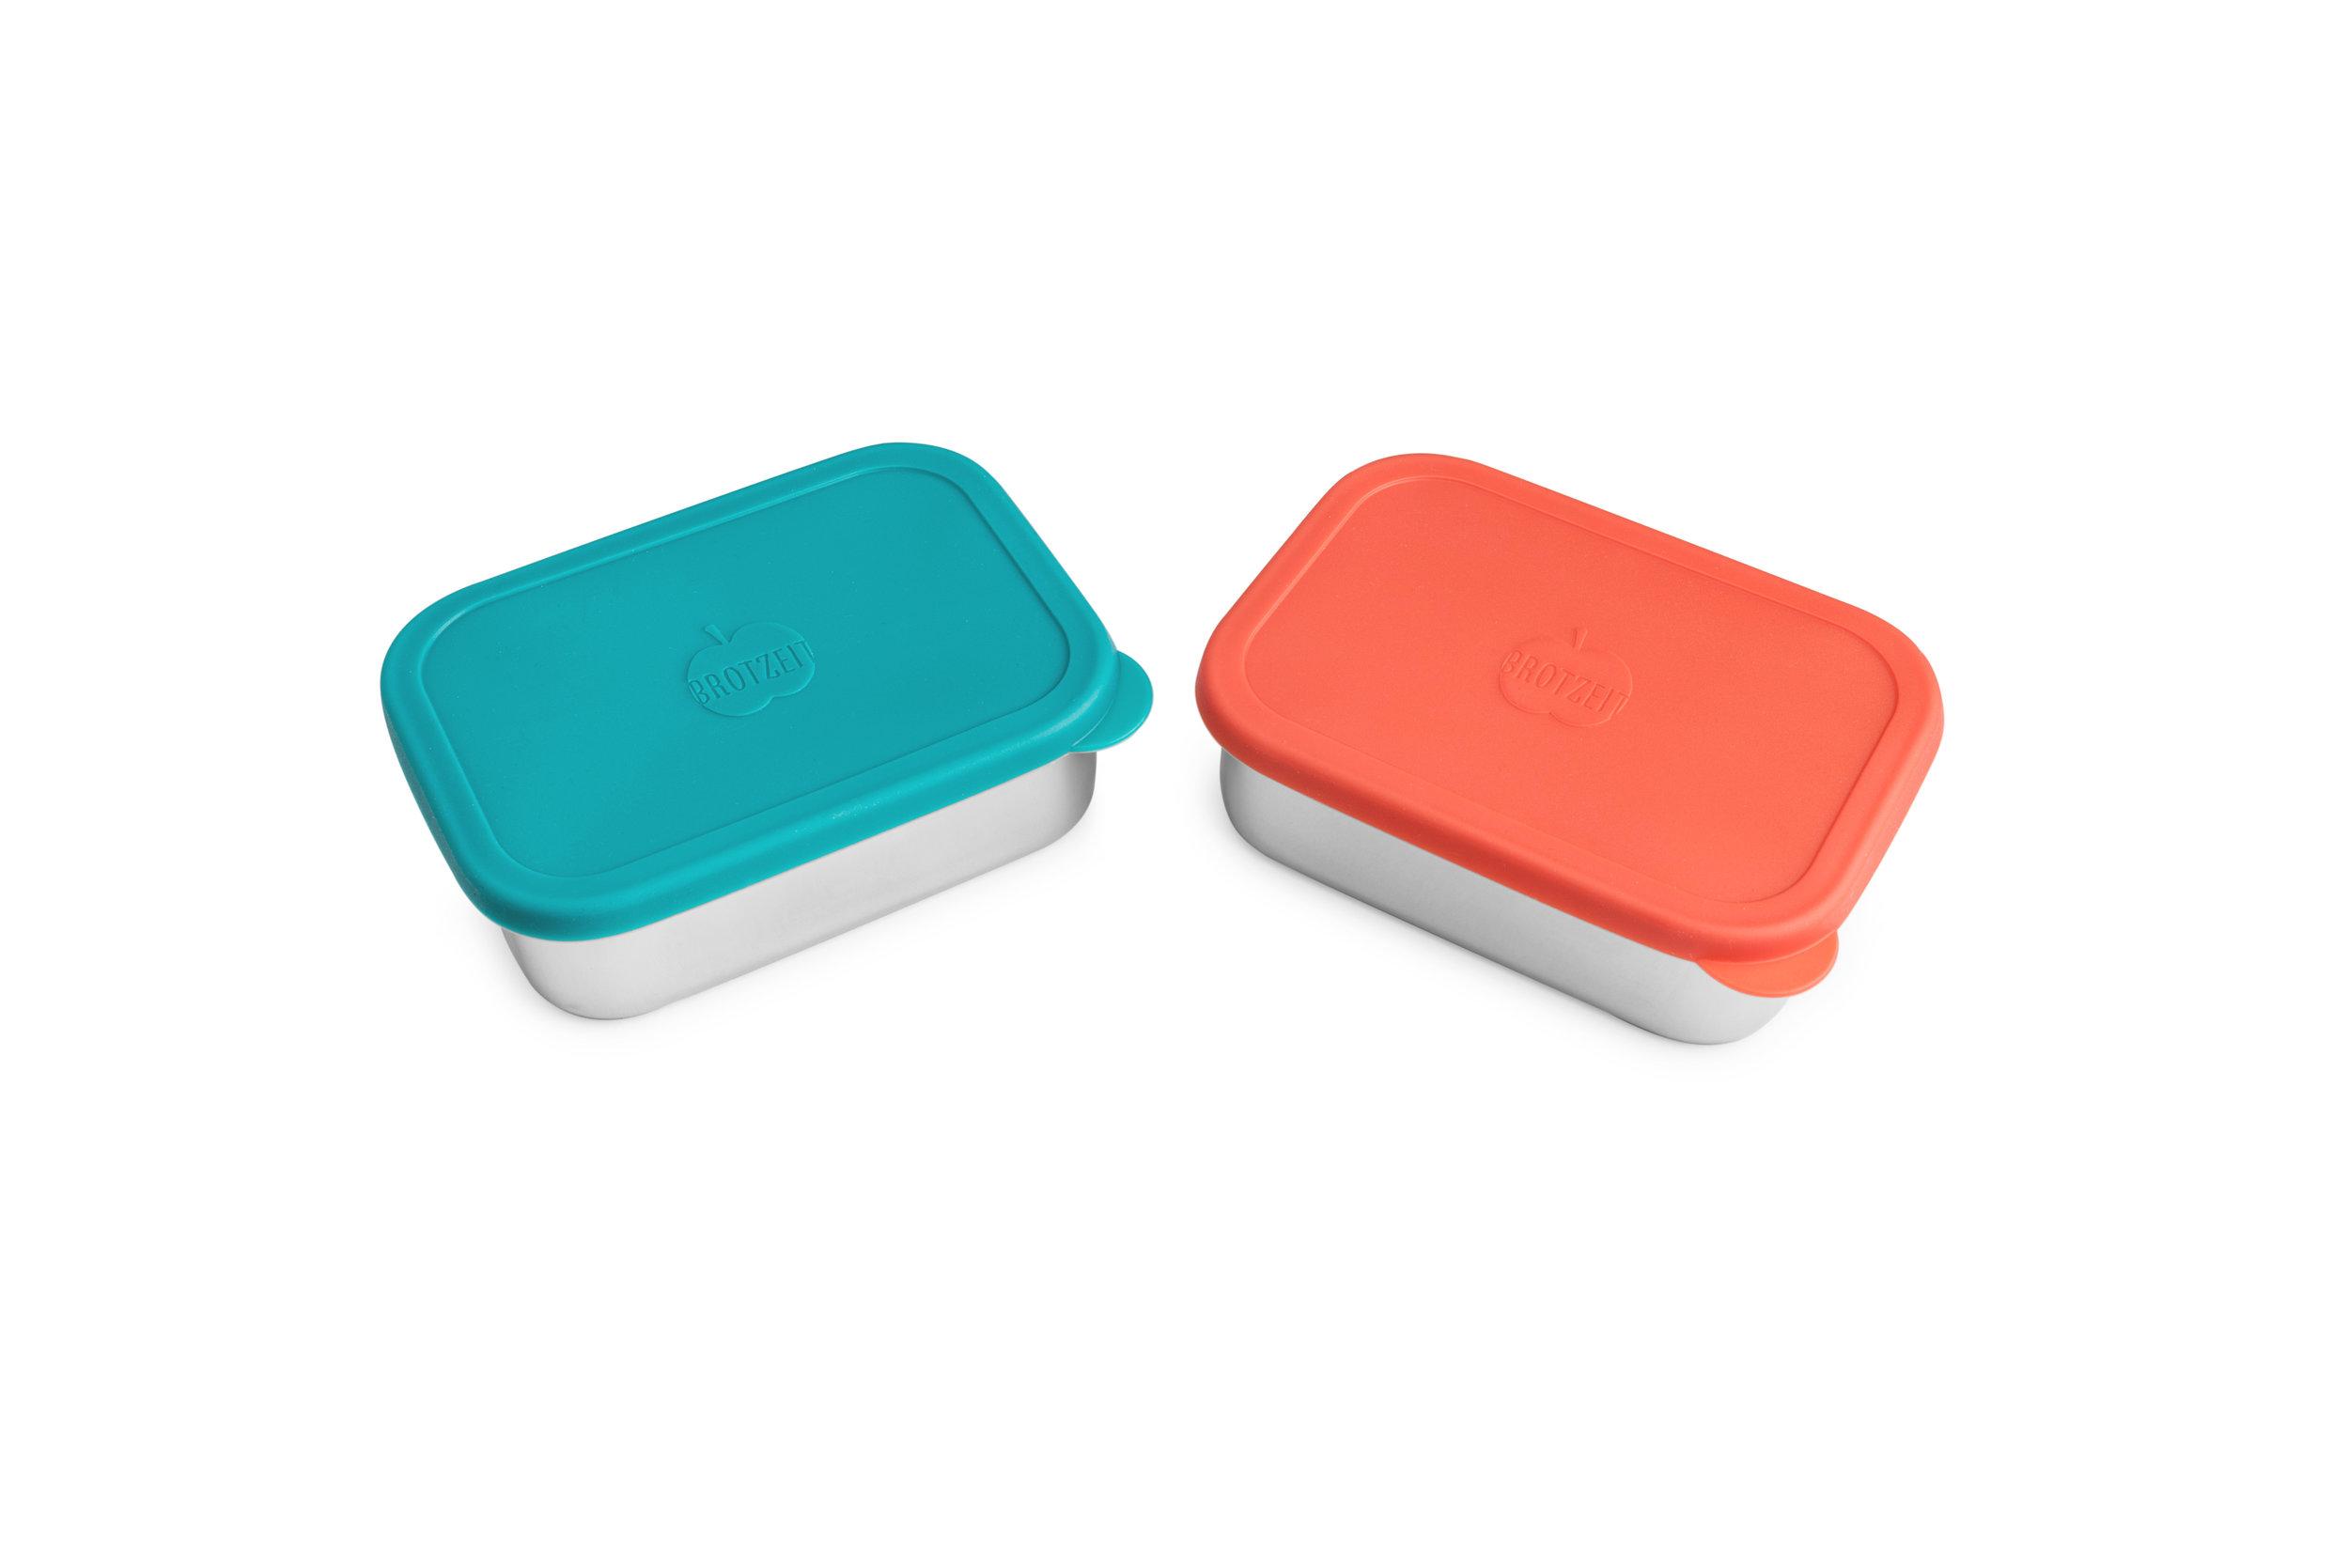 Kentop Lunchbox brotzeitbox pl/ástico Brotdose Fr/ühst/ücksbox Versiegelte Bento Box Proviantdose Frischhaltedose para la Escuela Picknick Camping 4 Compartimentos con Soppentablett